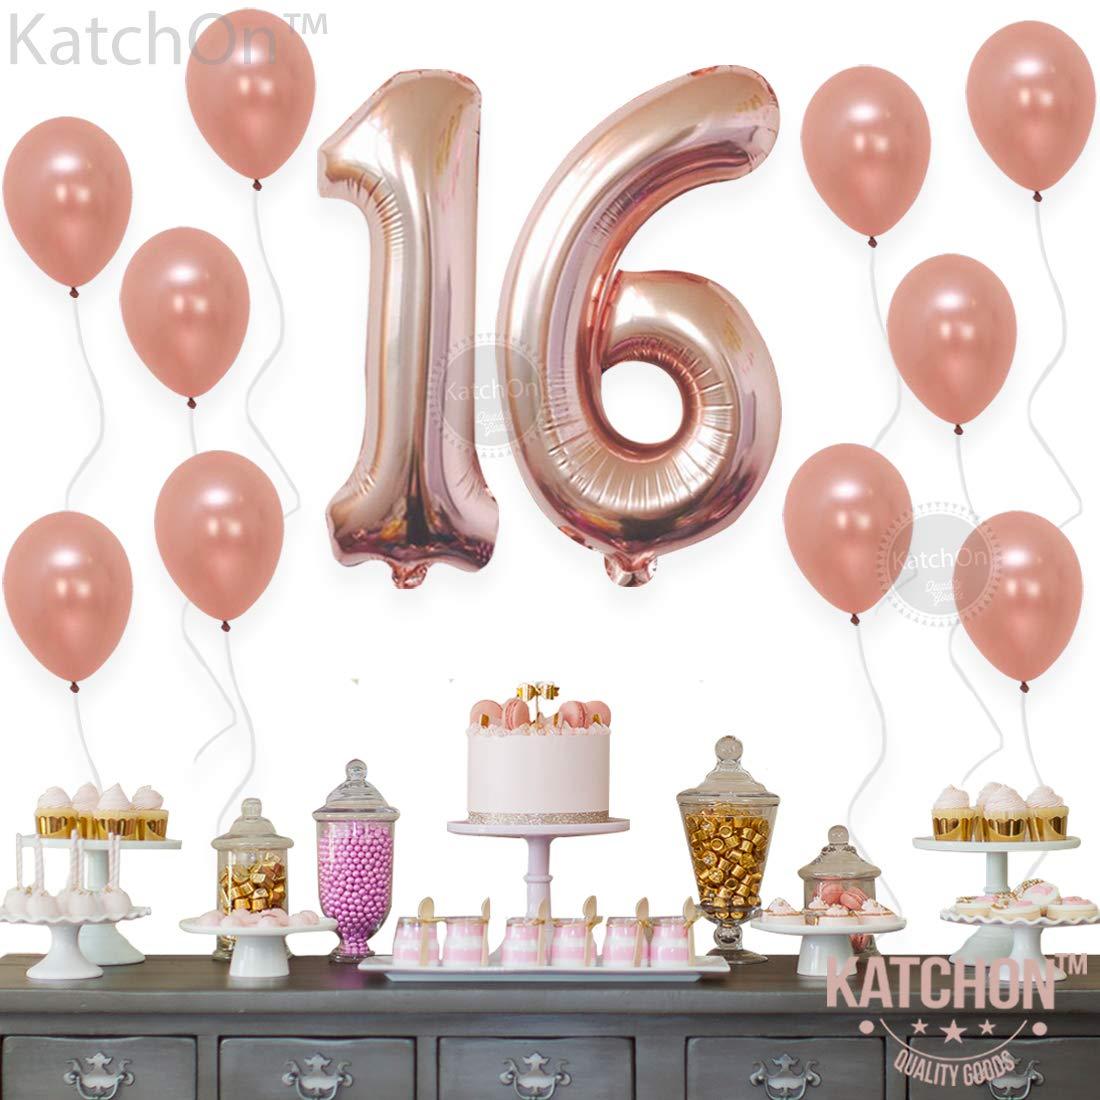 Amazon.com: Rose Gold Number 16 balloons - foil mylar Rose Gold ...